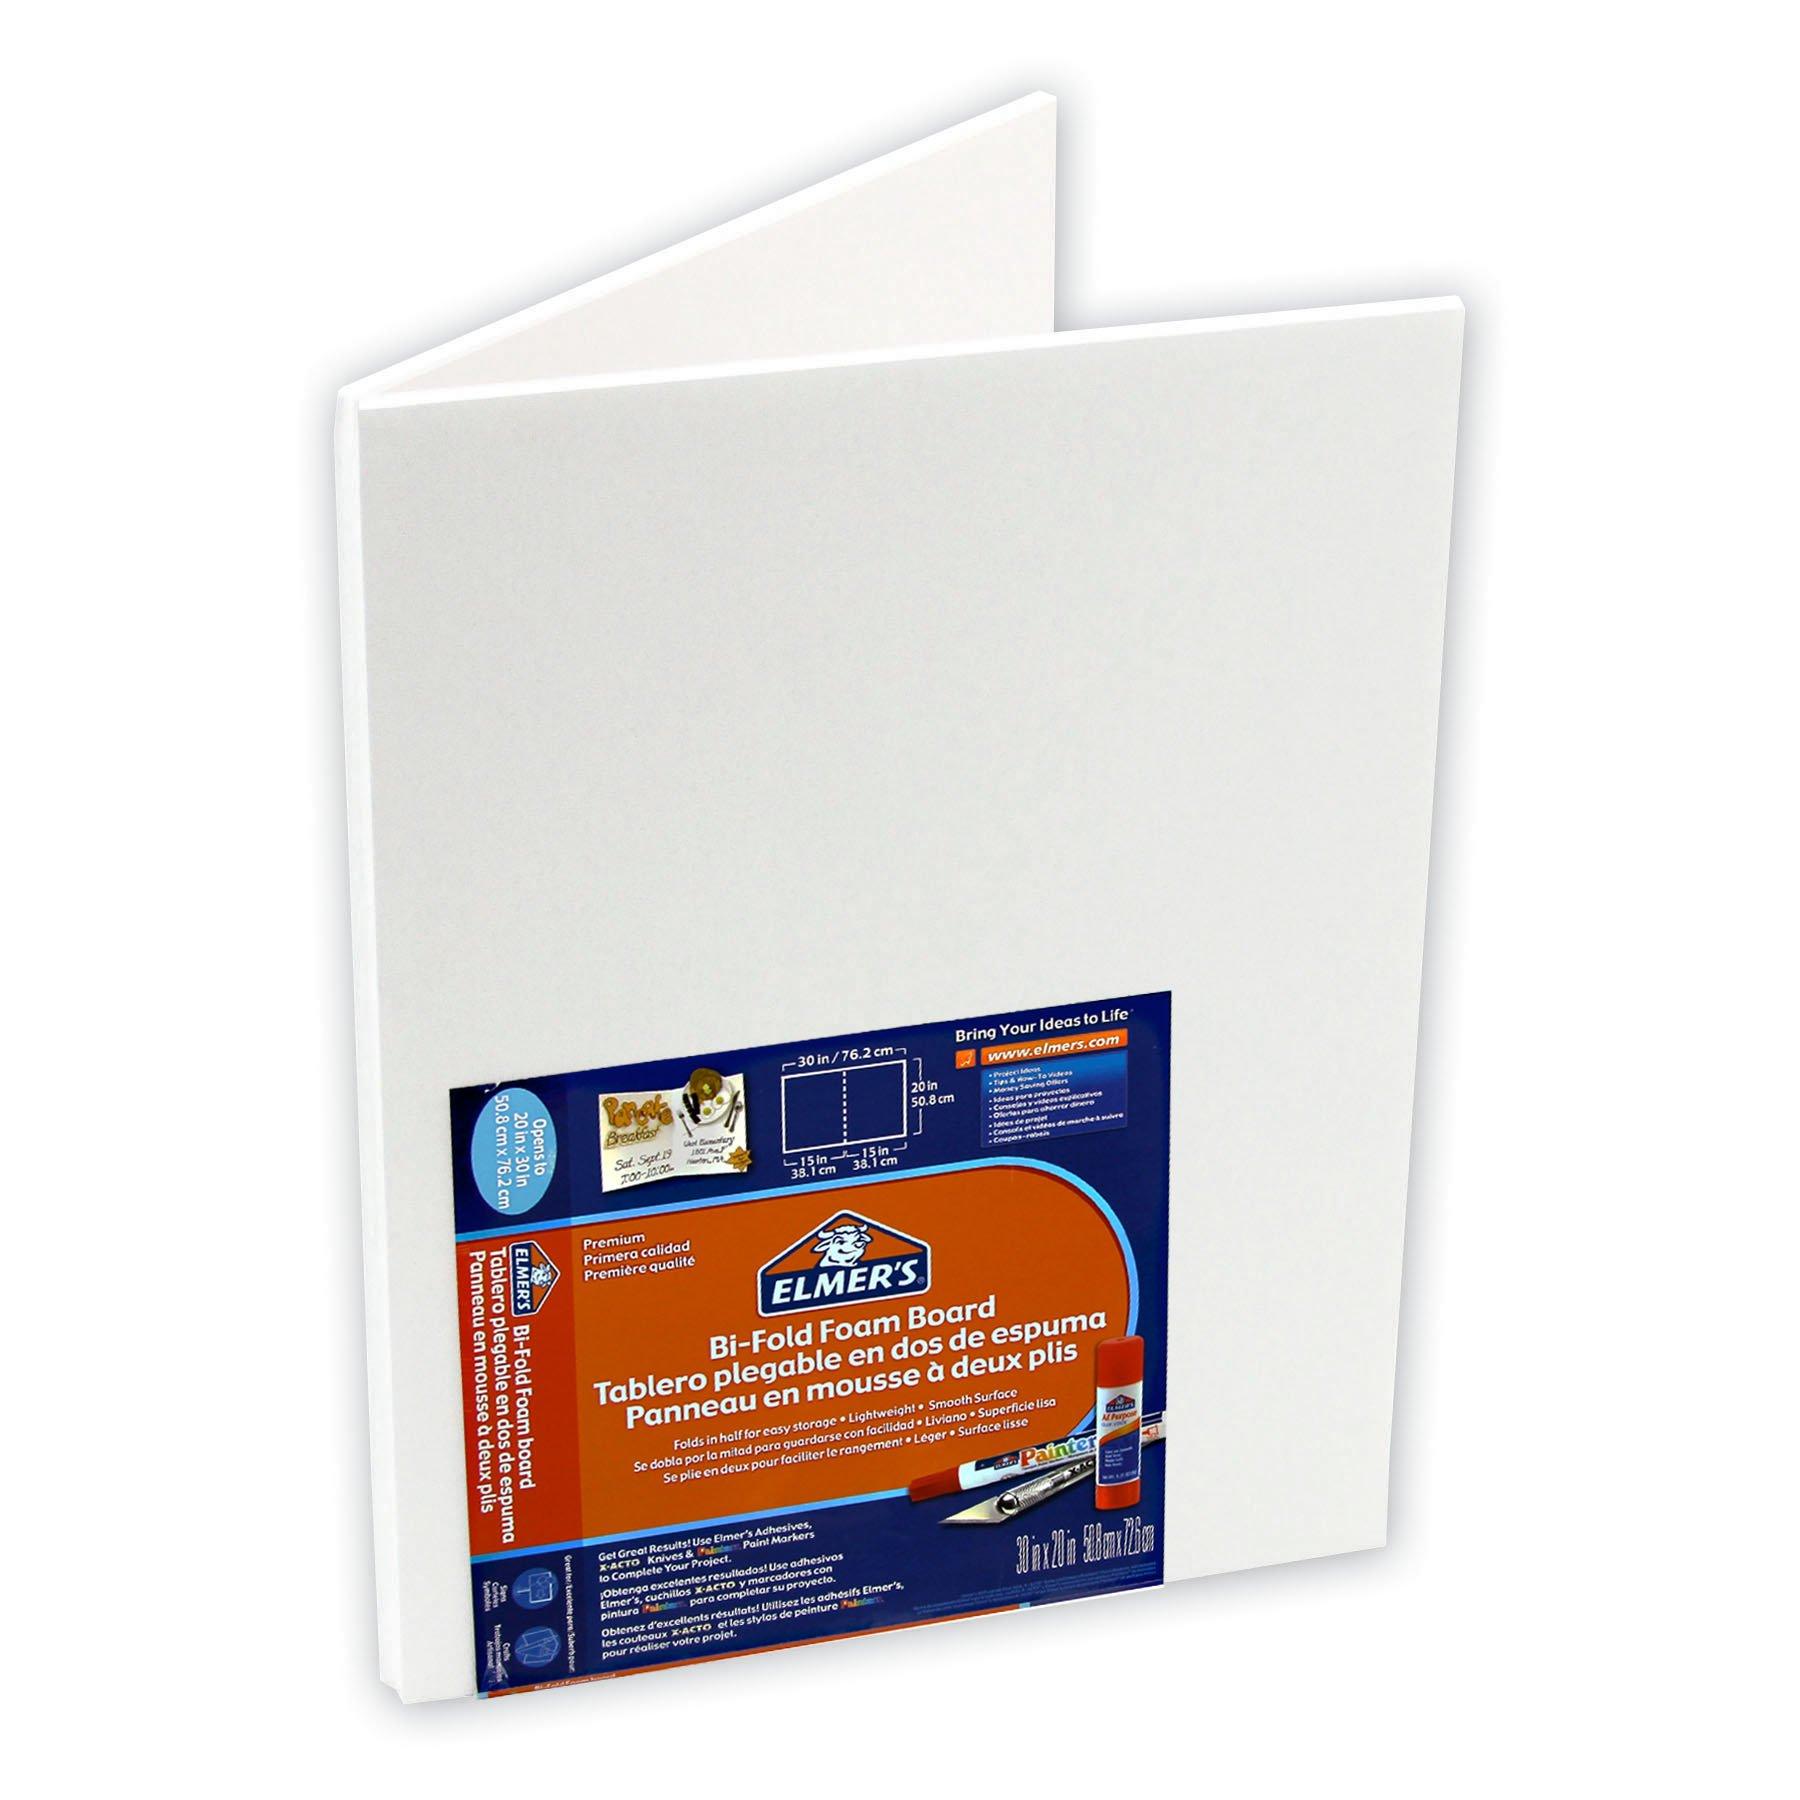 ELMERS Bi-Fold Foam Board, 15''X 20'', White (905165)